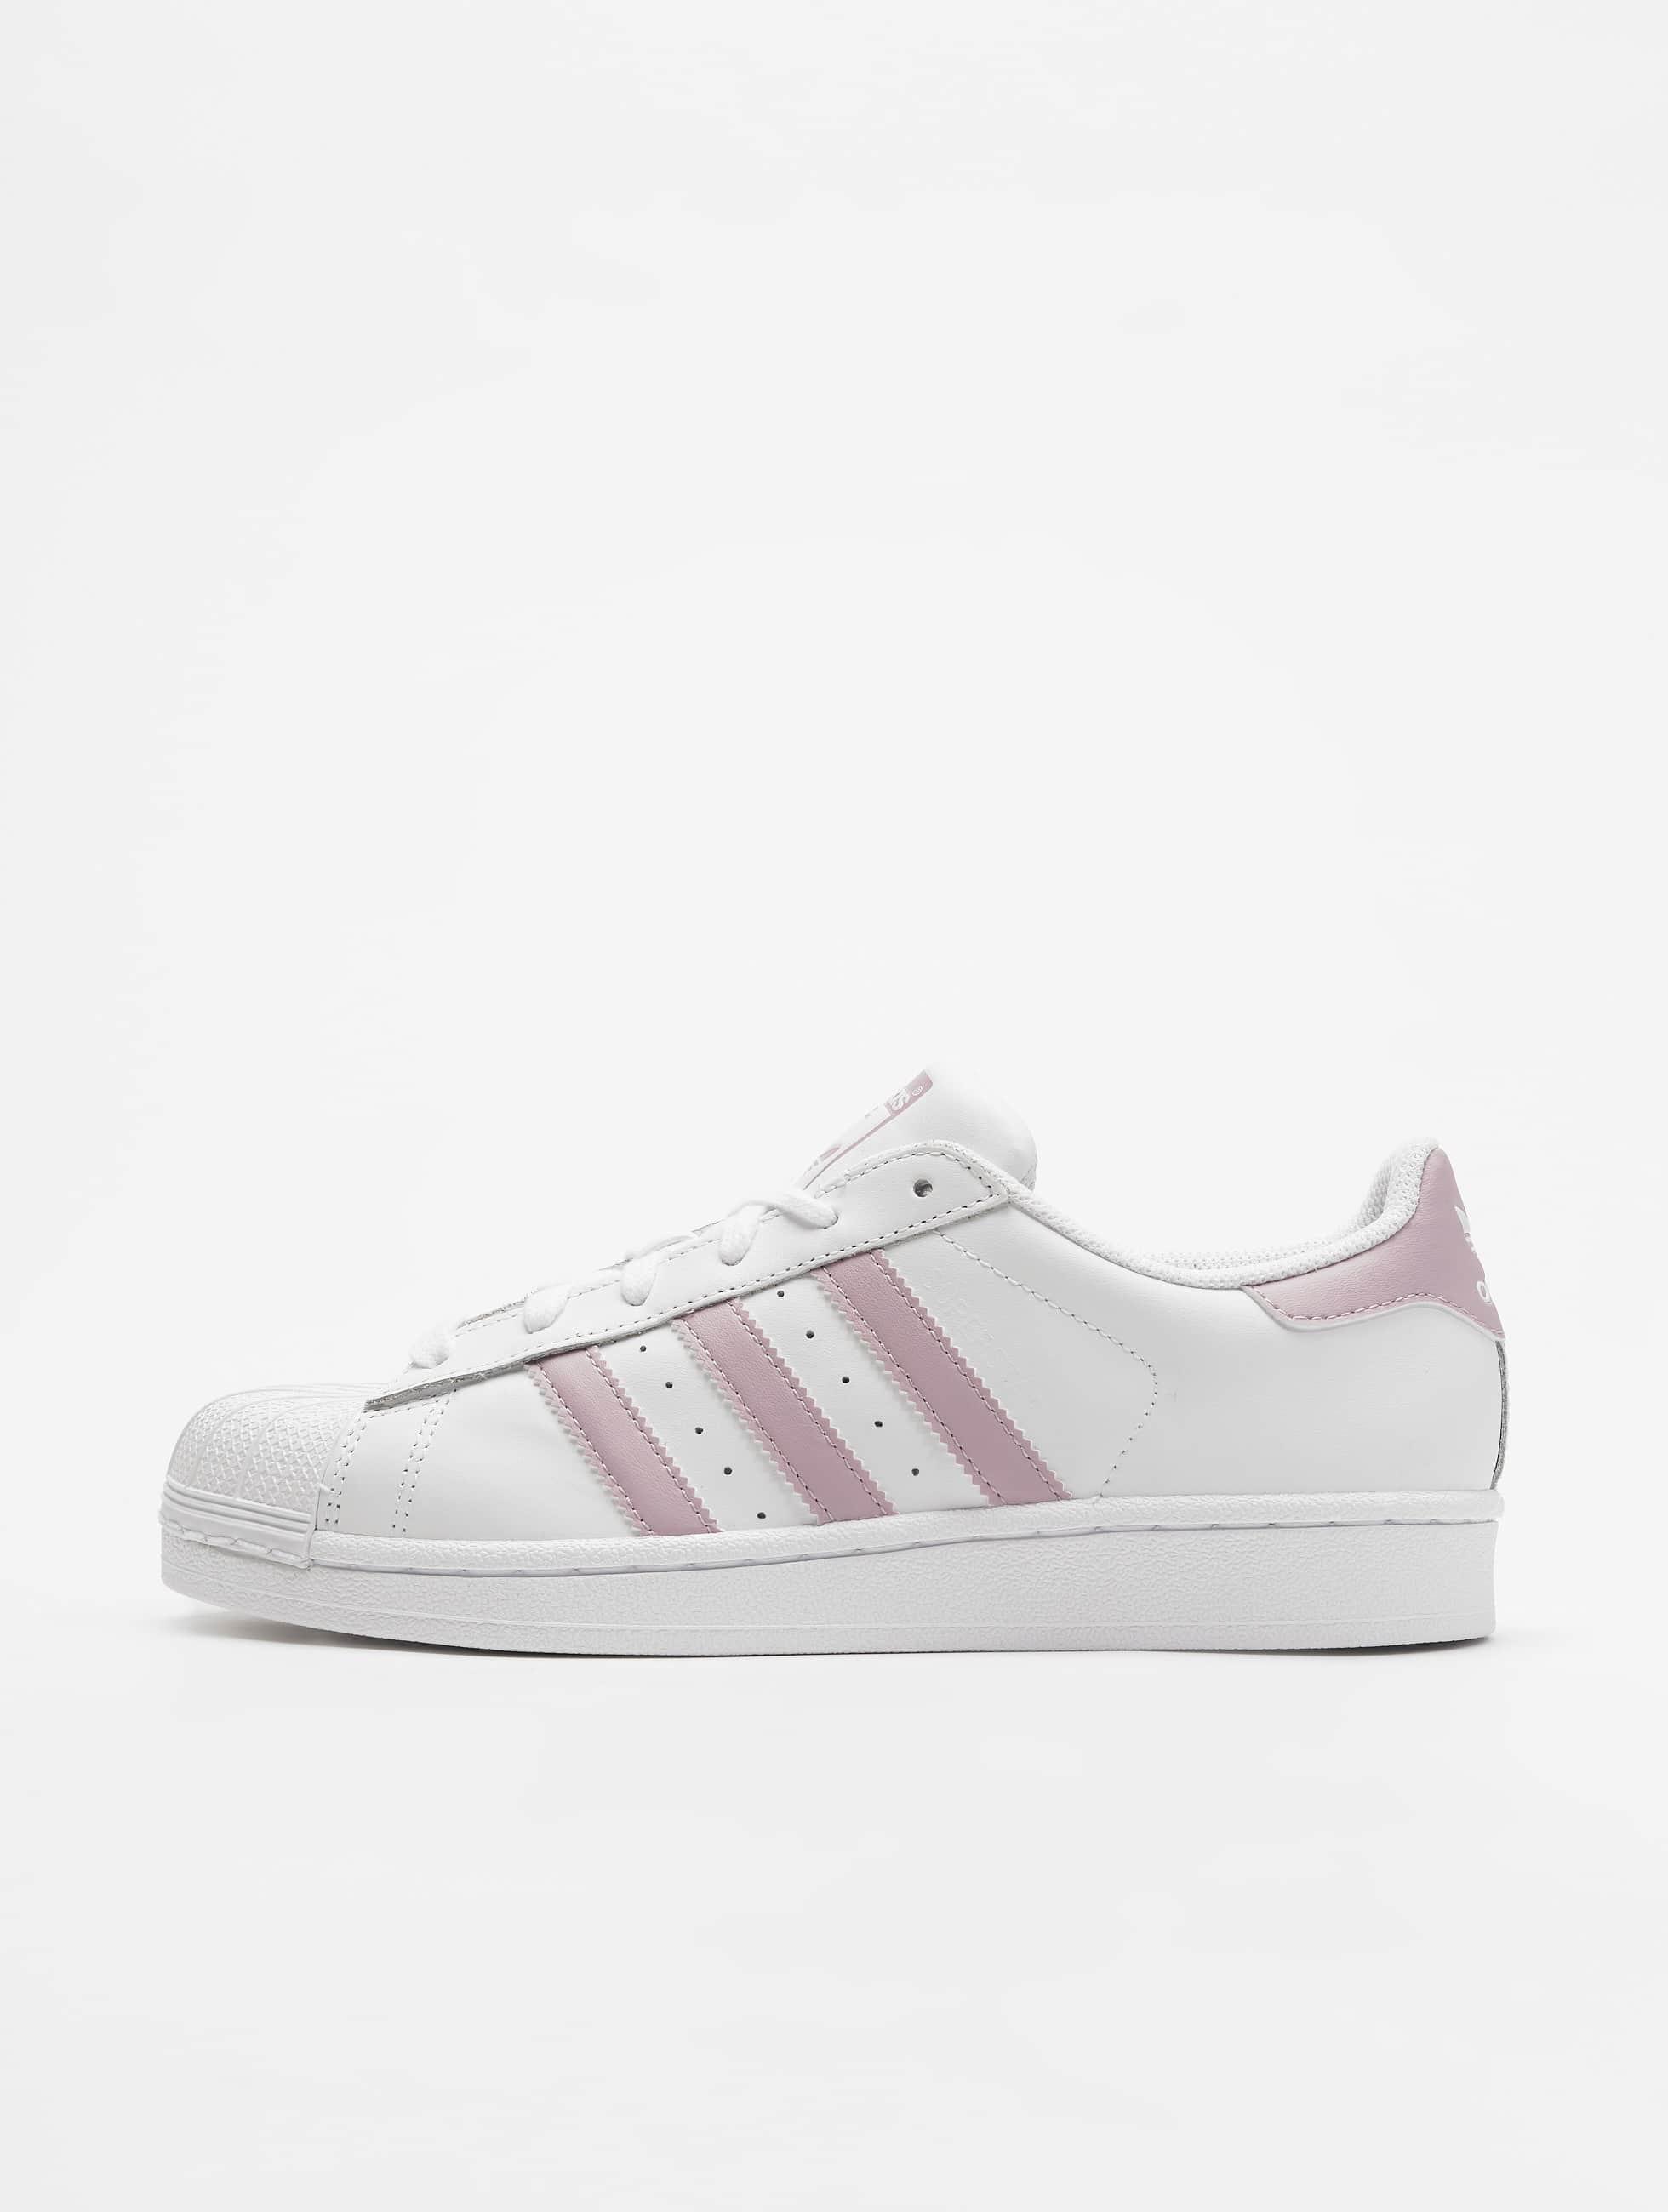 28694961a6a adidas originals schoen / sneaker Superstar W in wit 543076